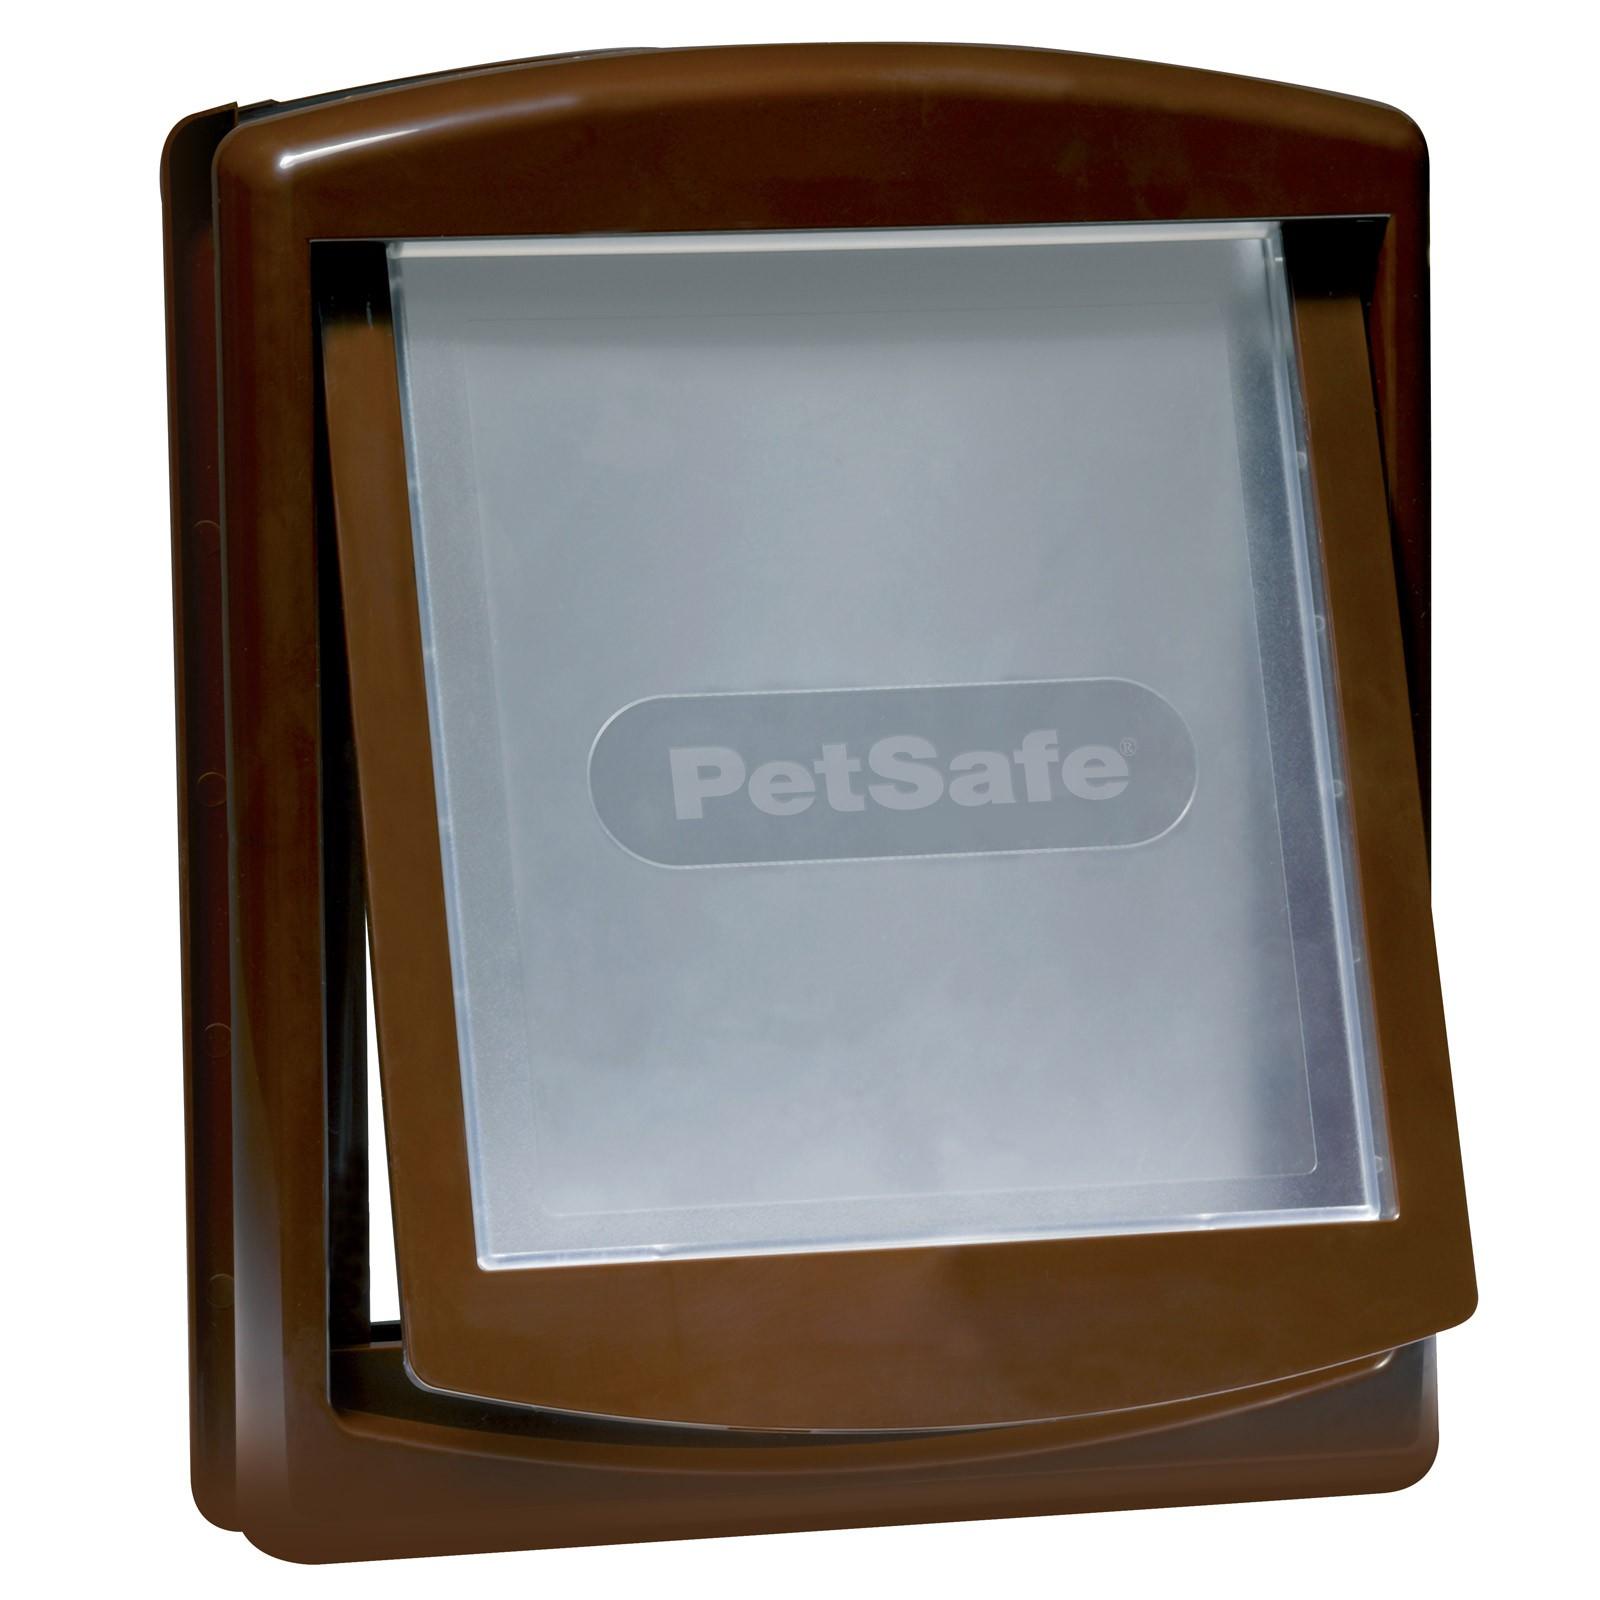 Petsafe Staywell Hundeklappe / Hundetür 2-Wege Hunde Türe K755SGIFD